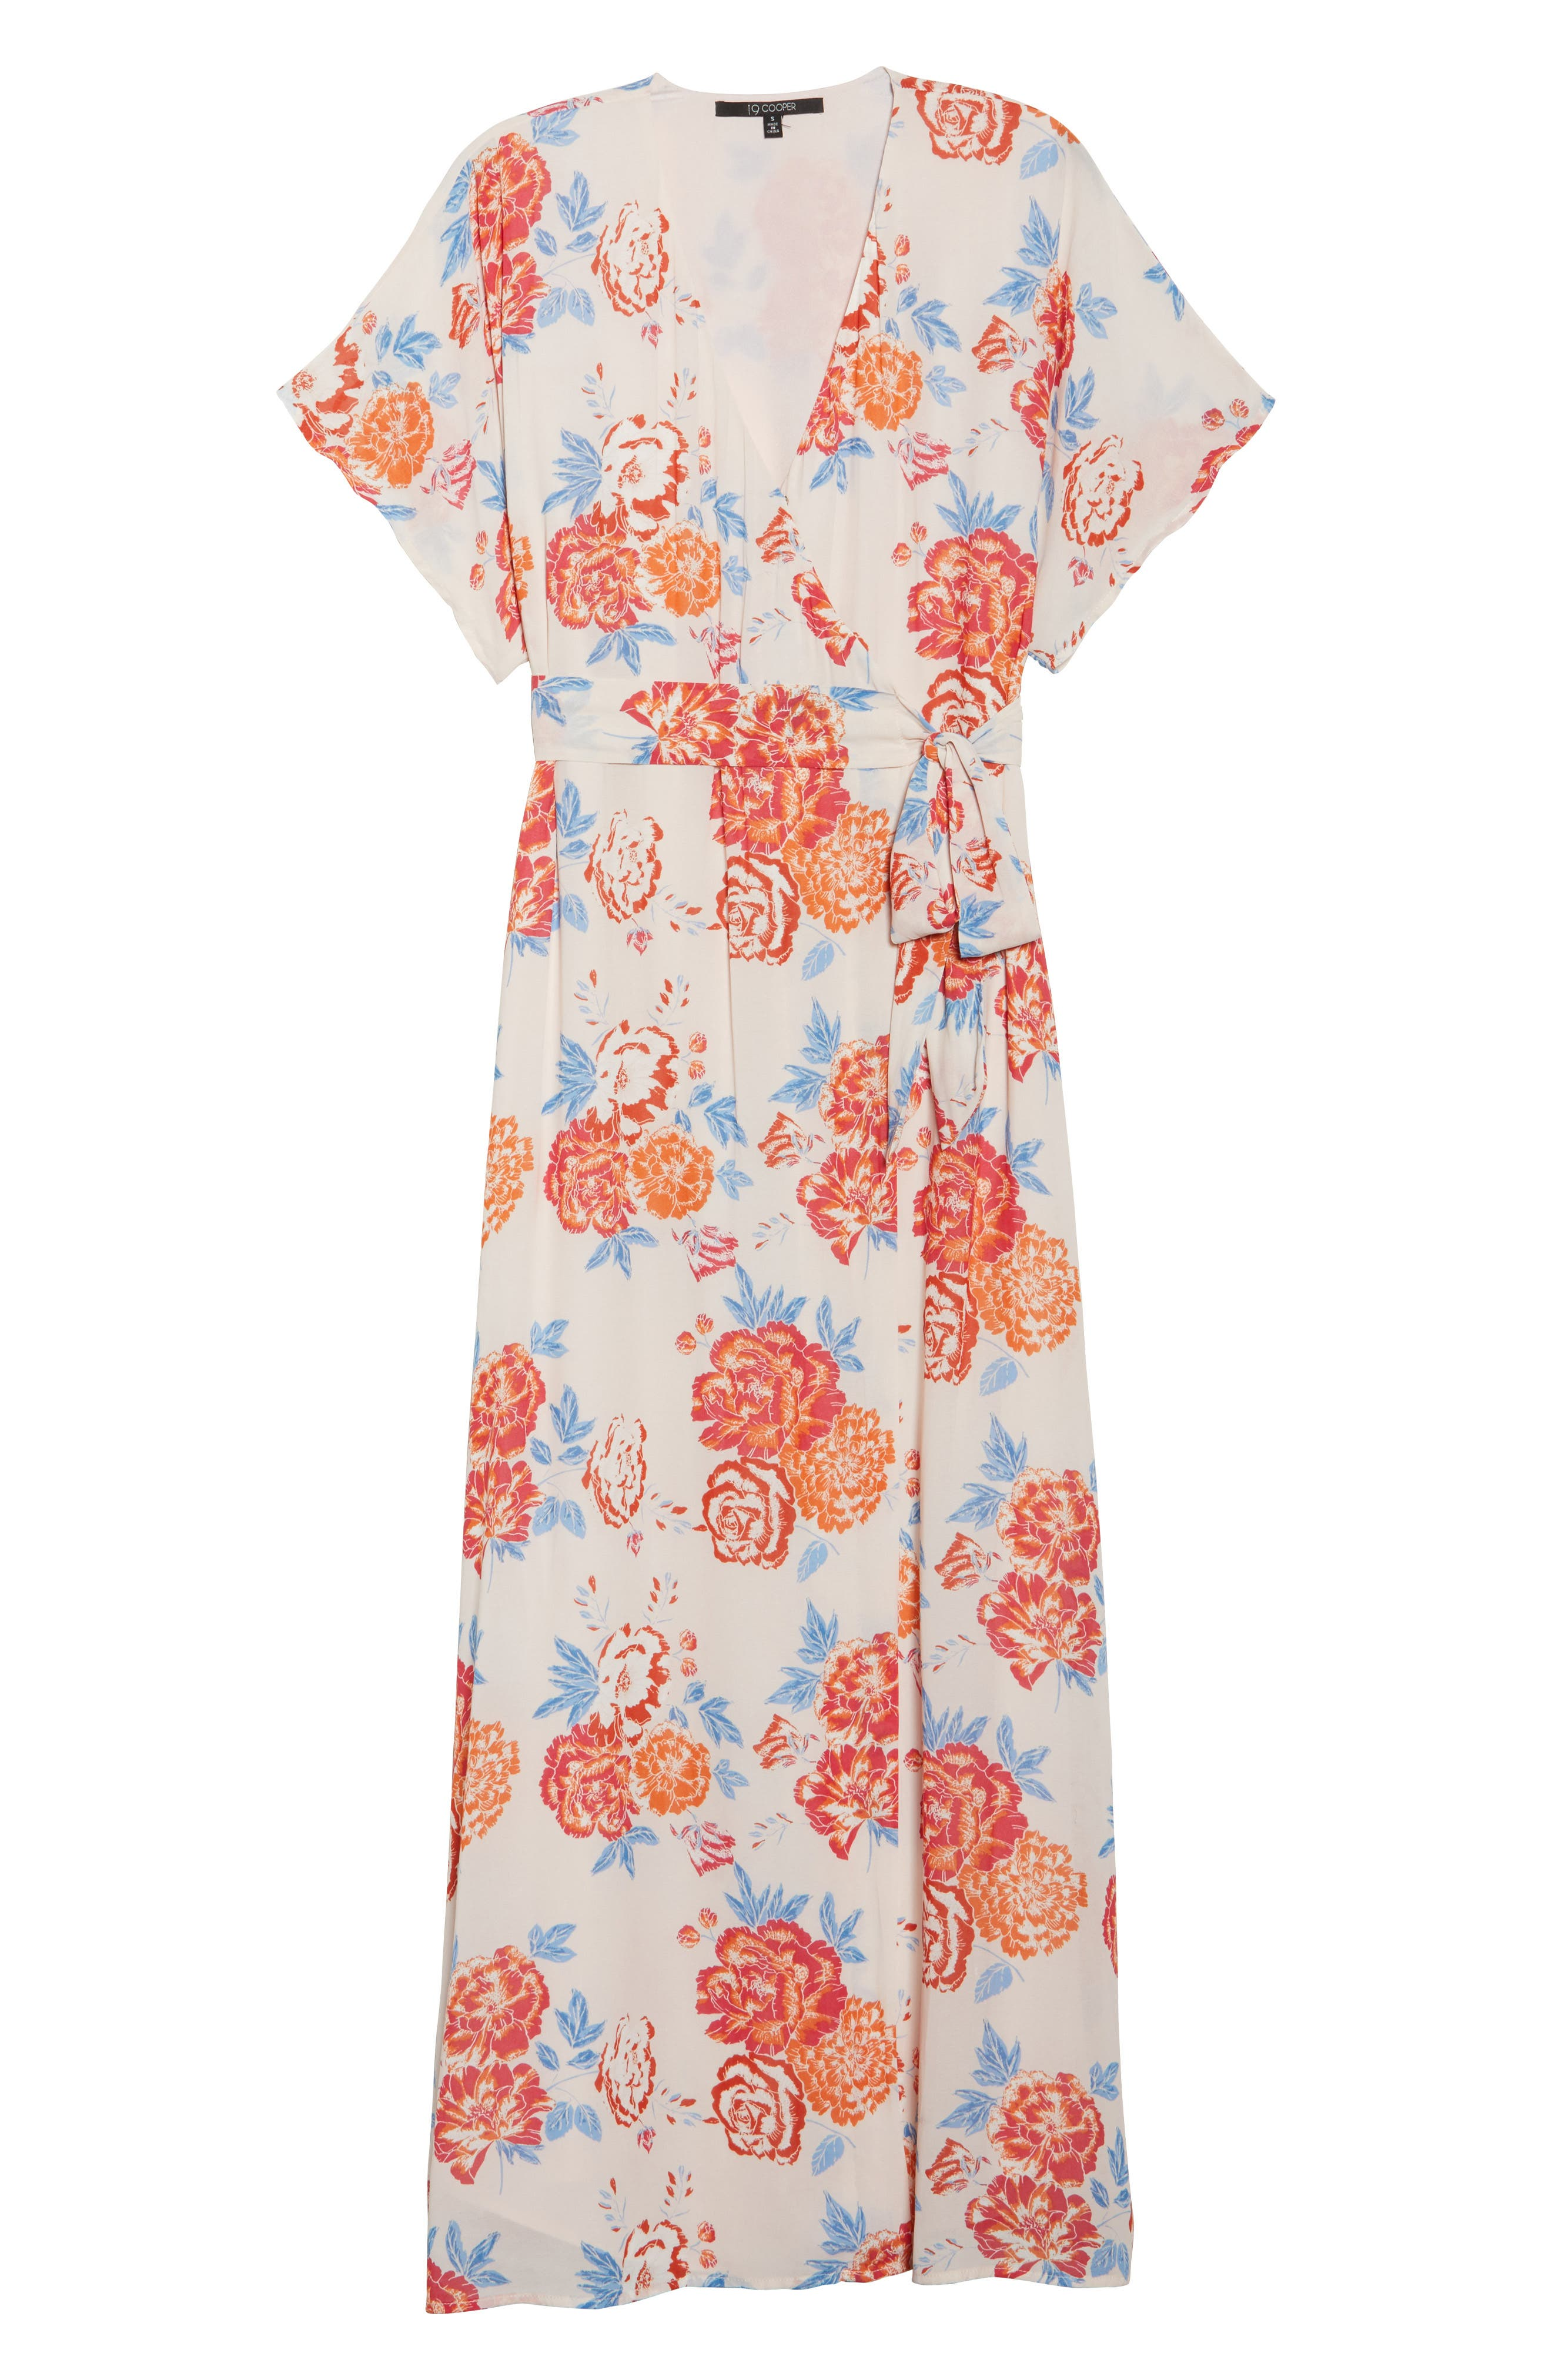 Floral Tie Waist Maxi Dress,                             Alternate thumbnail 7, color,                             Pink/ Coral Multi